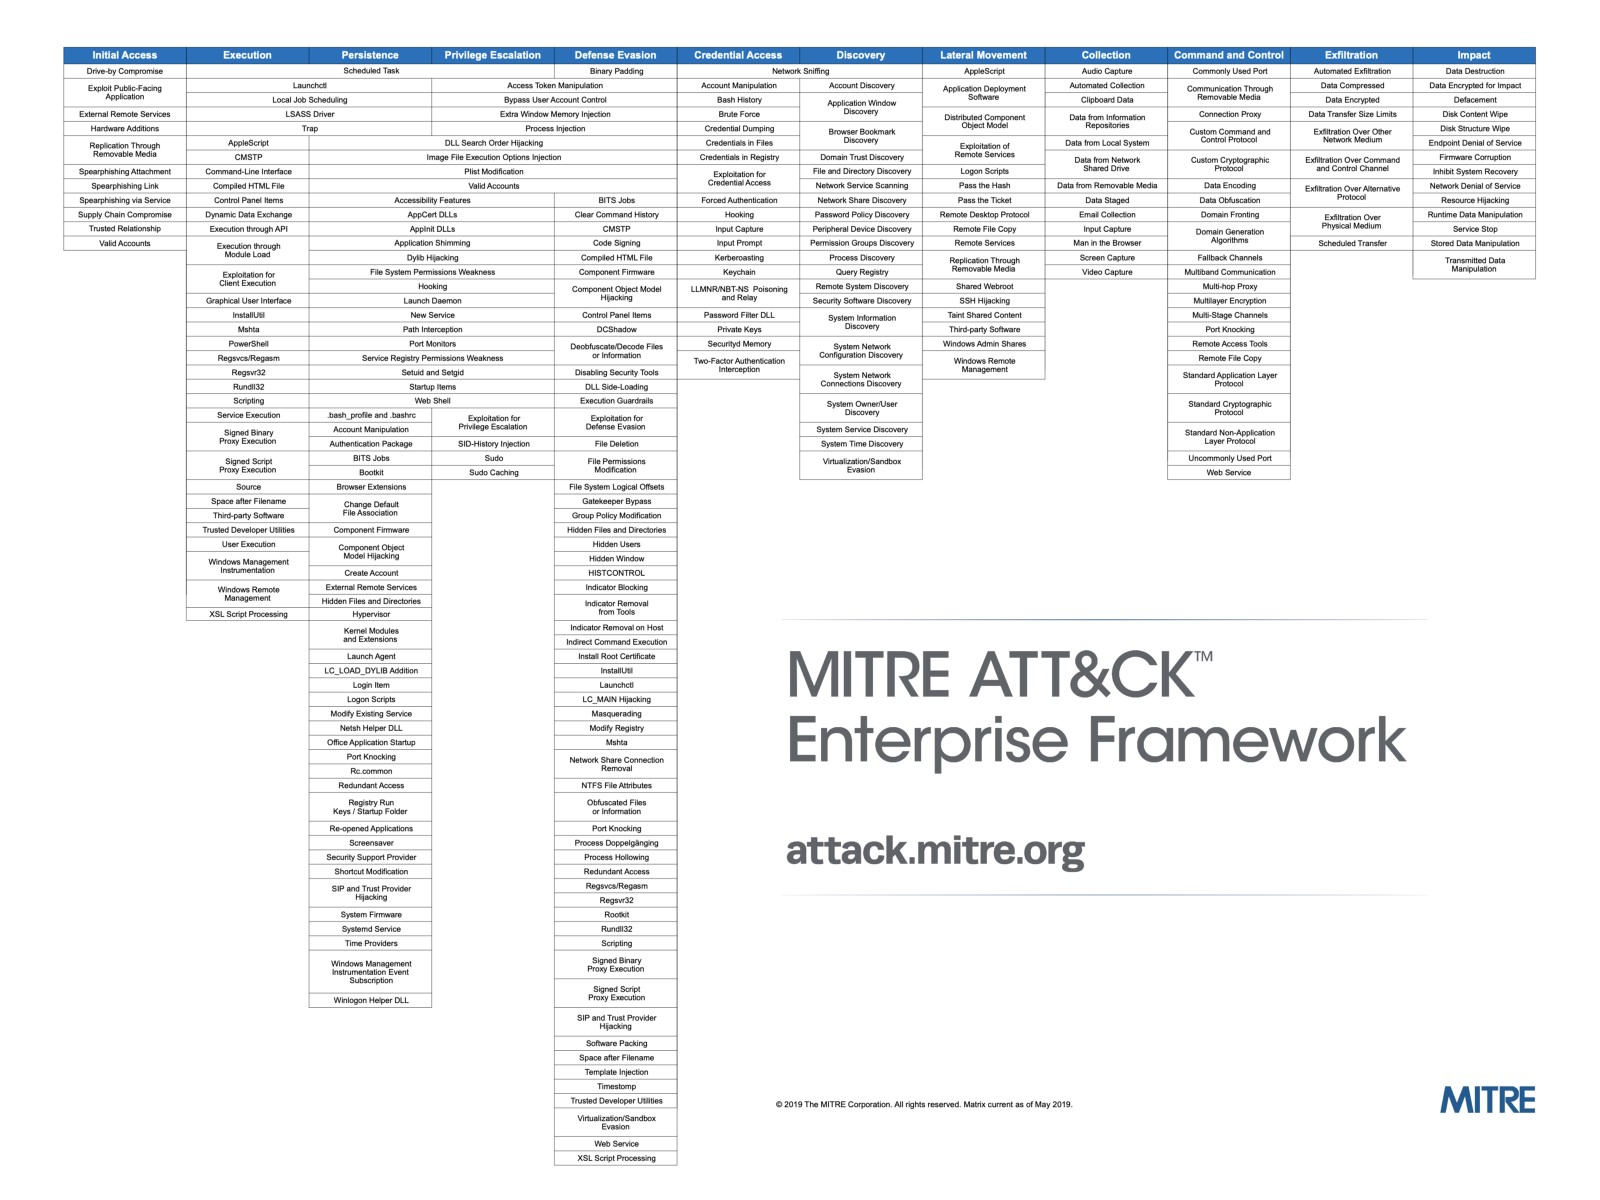 MITRE-ATTCK-Enterprise-Framework